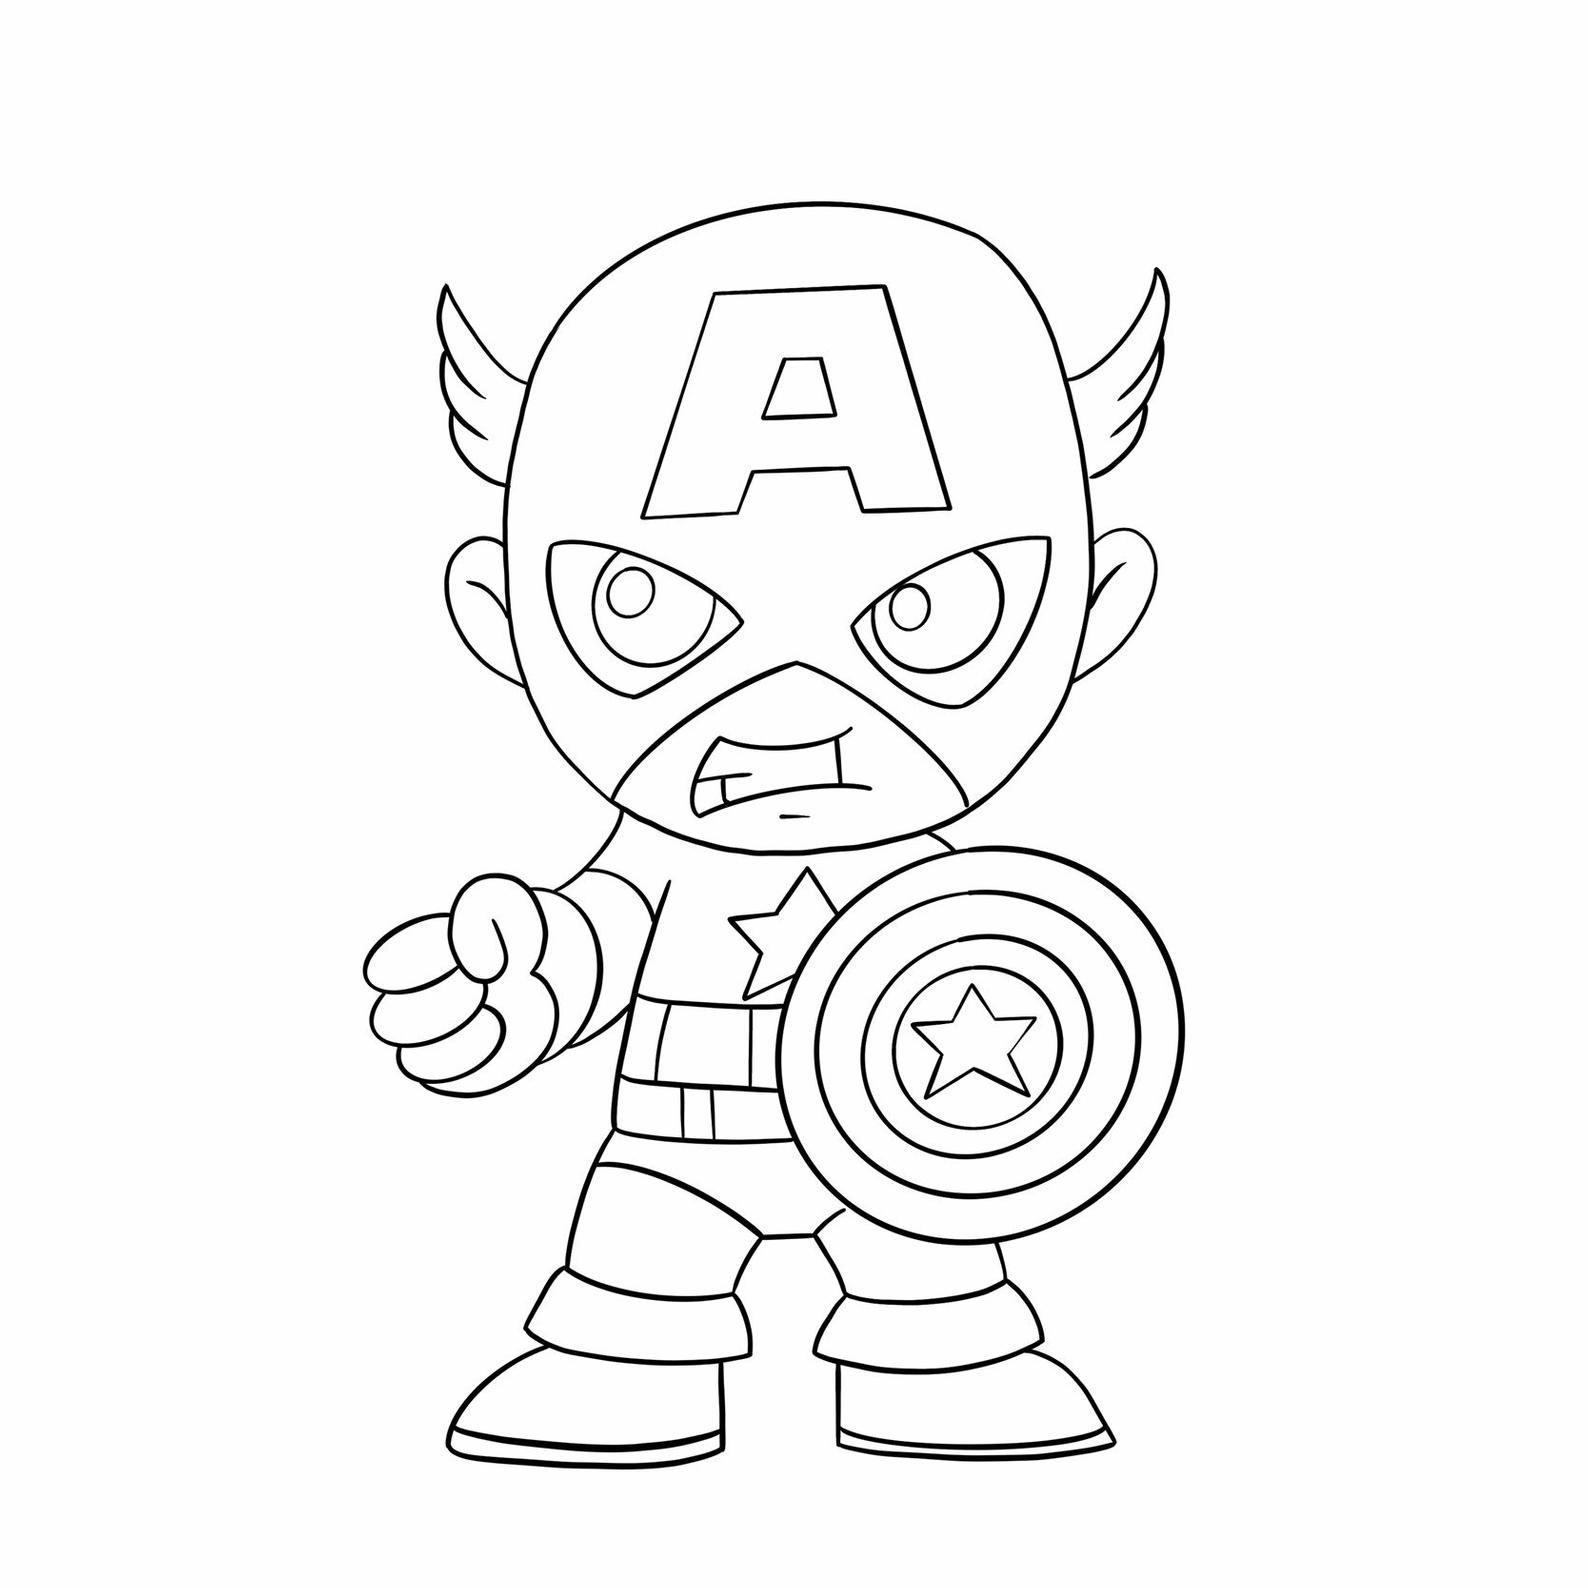 Png Iron Man Captain America Captain Marvel Black Widow Shazam Clipart Avengers Endgame Free Coloring Children Gift Dc Superheroes Para Colorear Iron Man Para Colorear Caricatura De Bebe